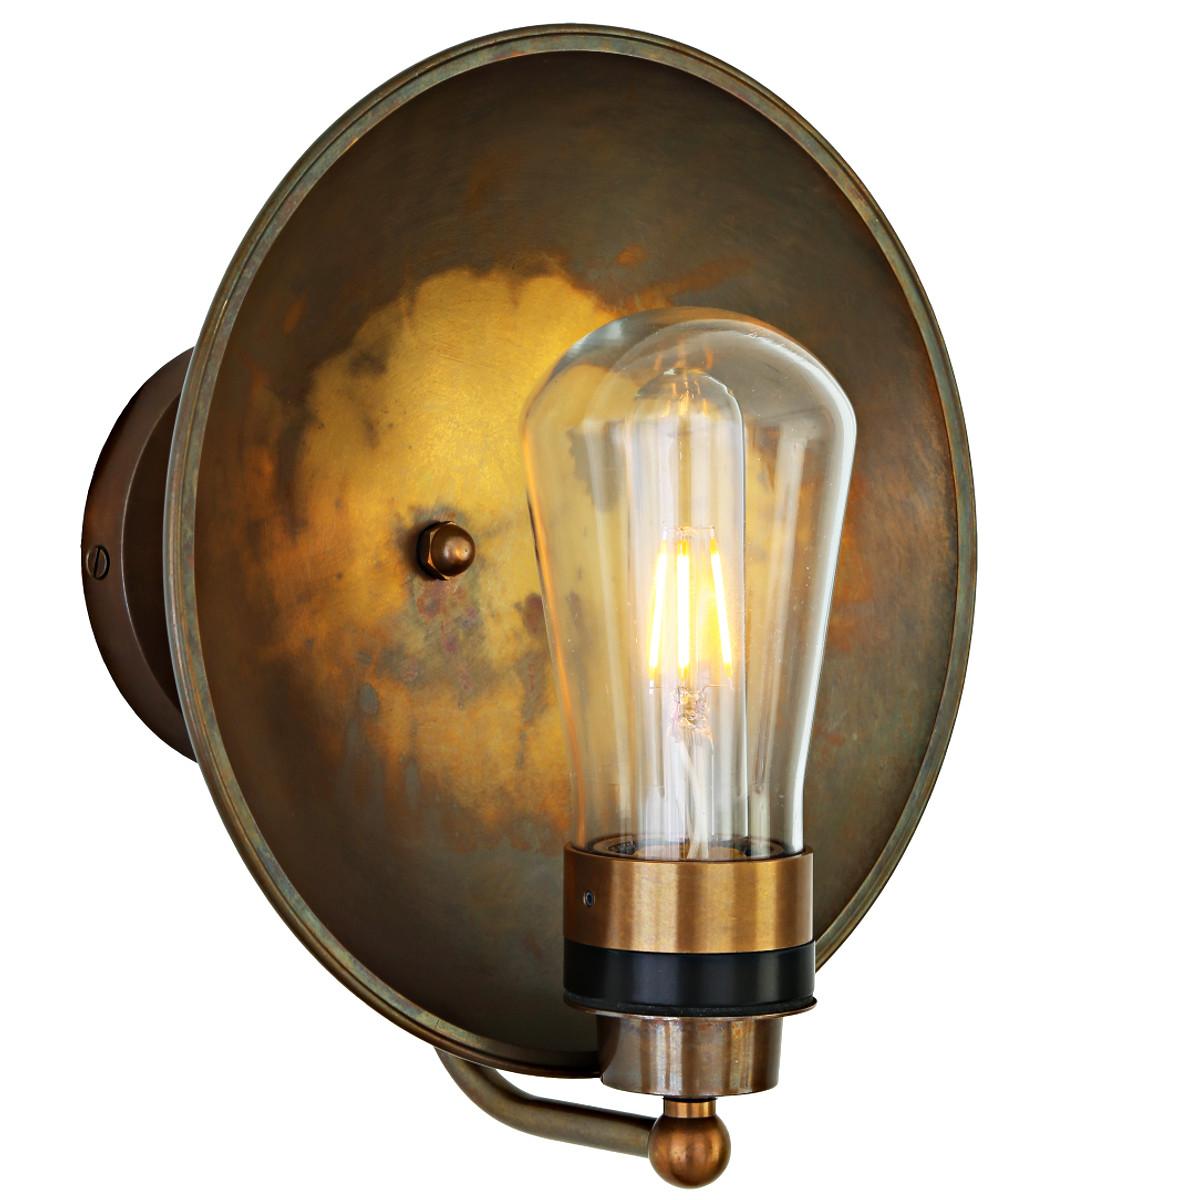 Nostalgische Badezimmer-Wandlampe, IP65 - Casa Lumi